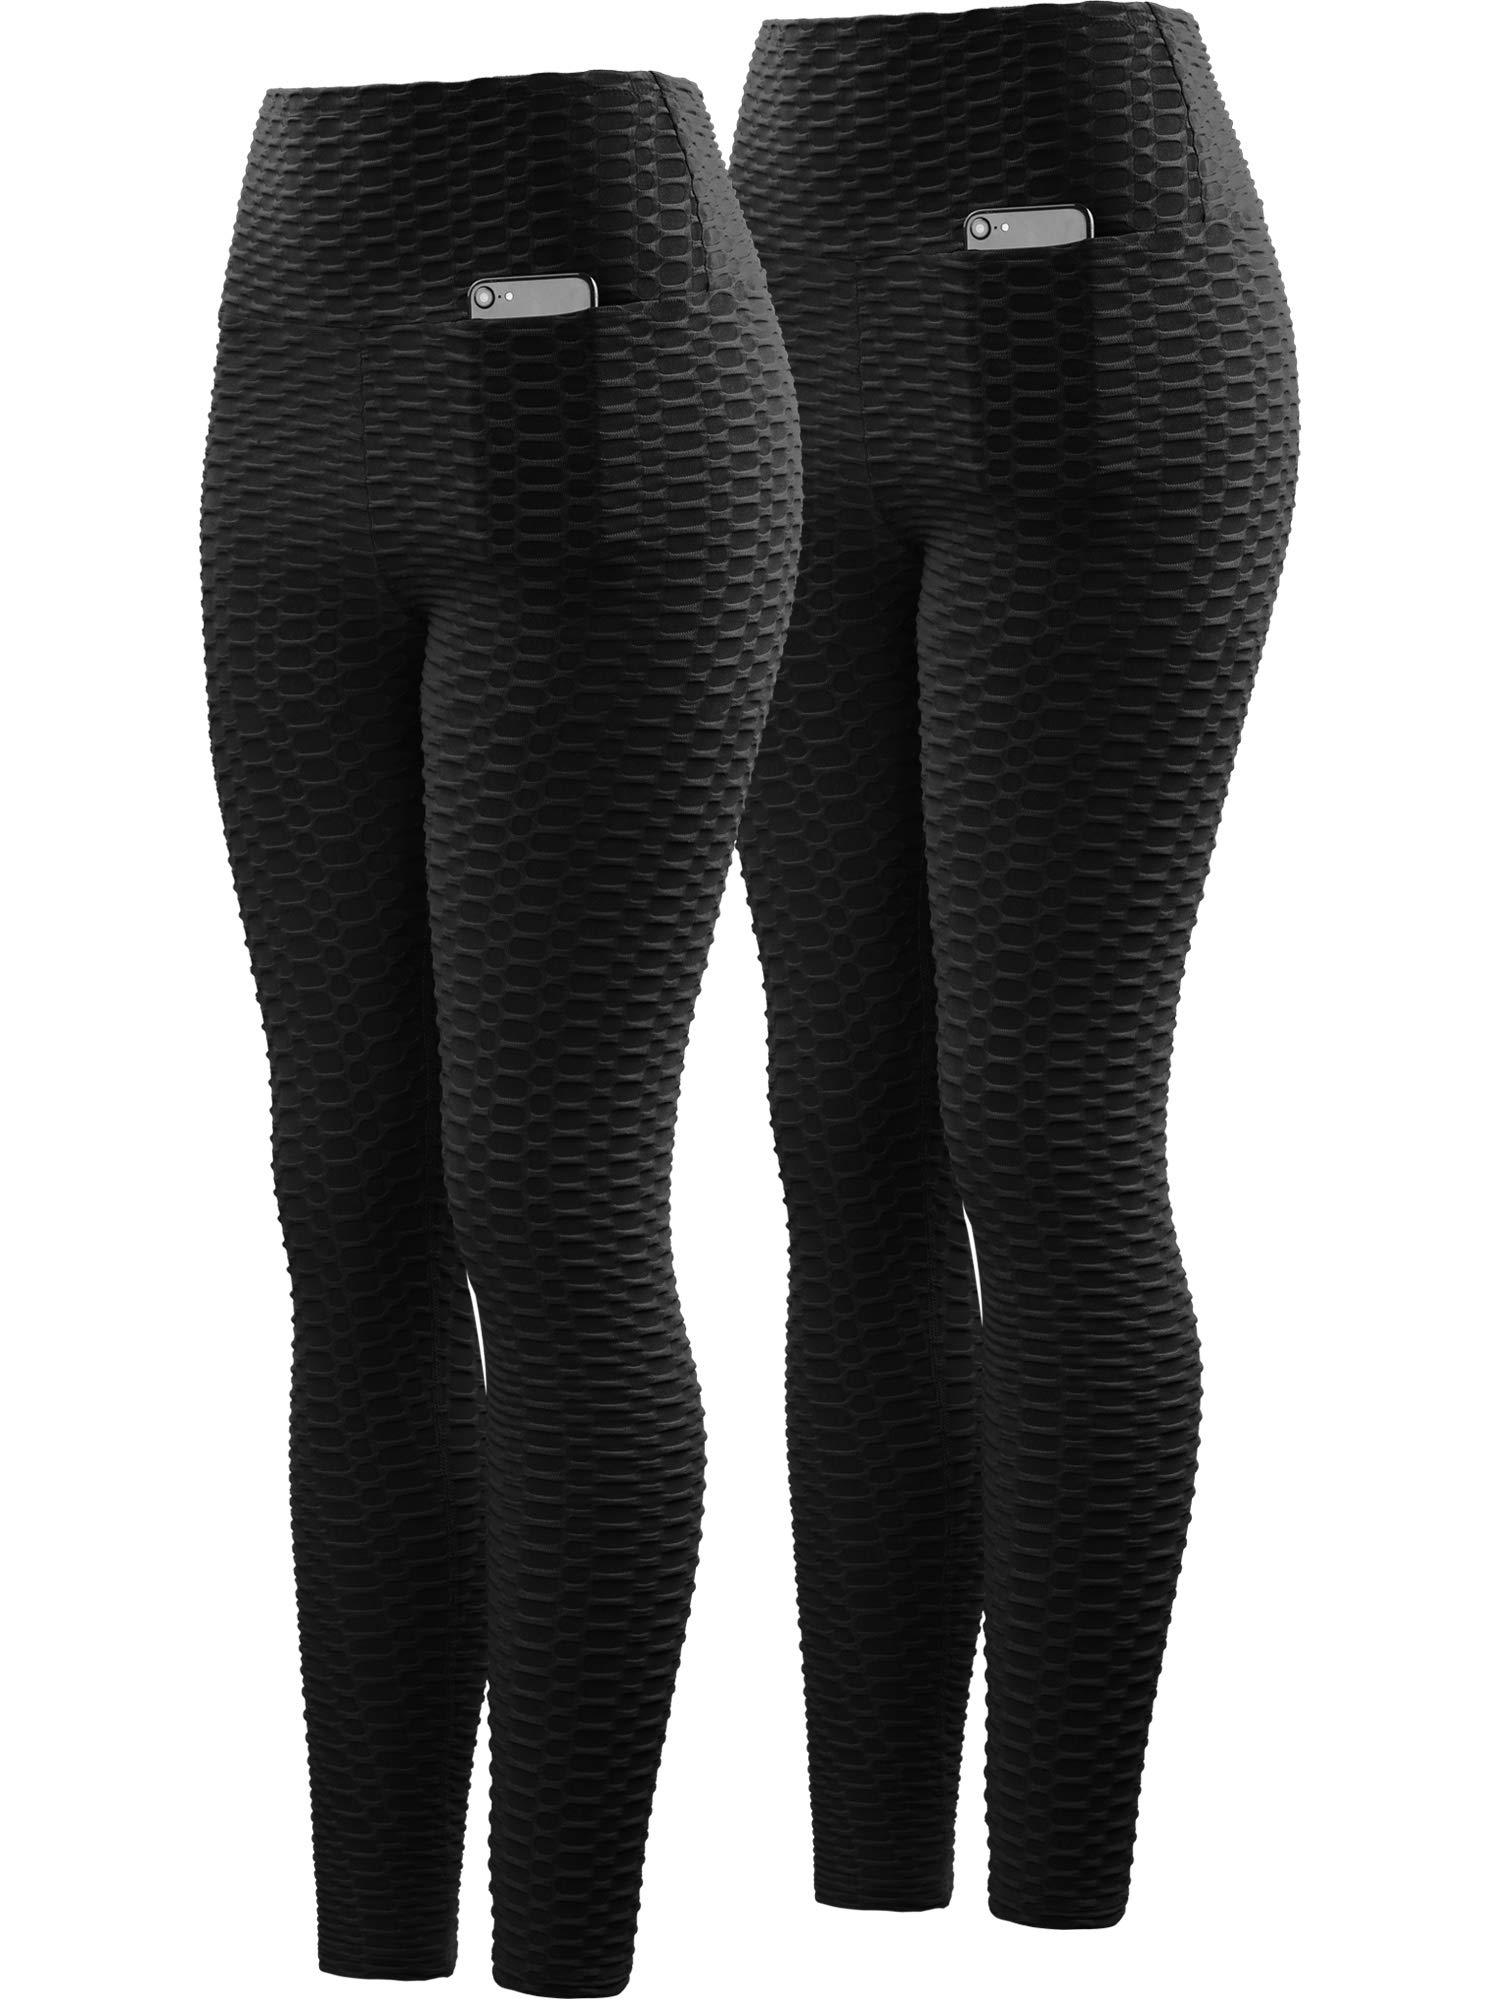 Neleus Women's 2 Pack Tummy Control High Waist Leggings Out Pocket,9036,Black/Black,S,EU M